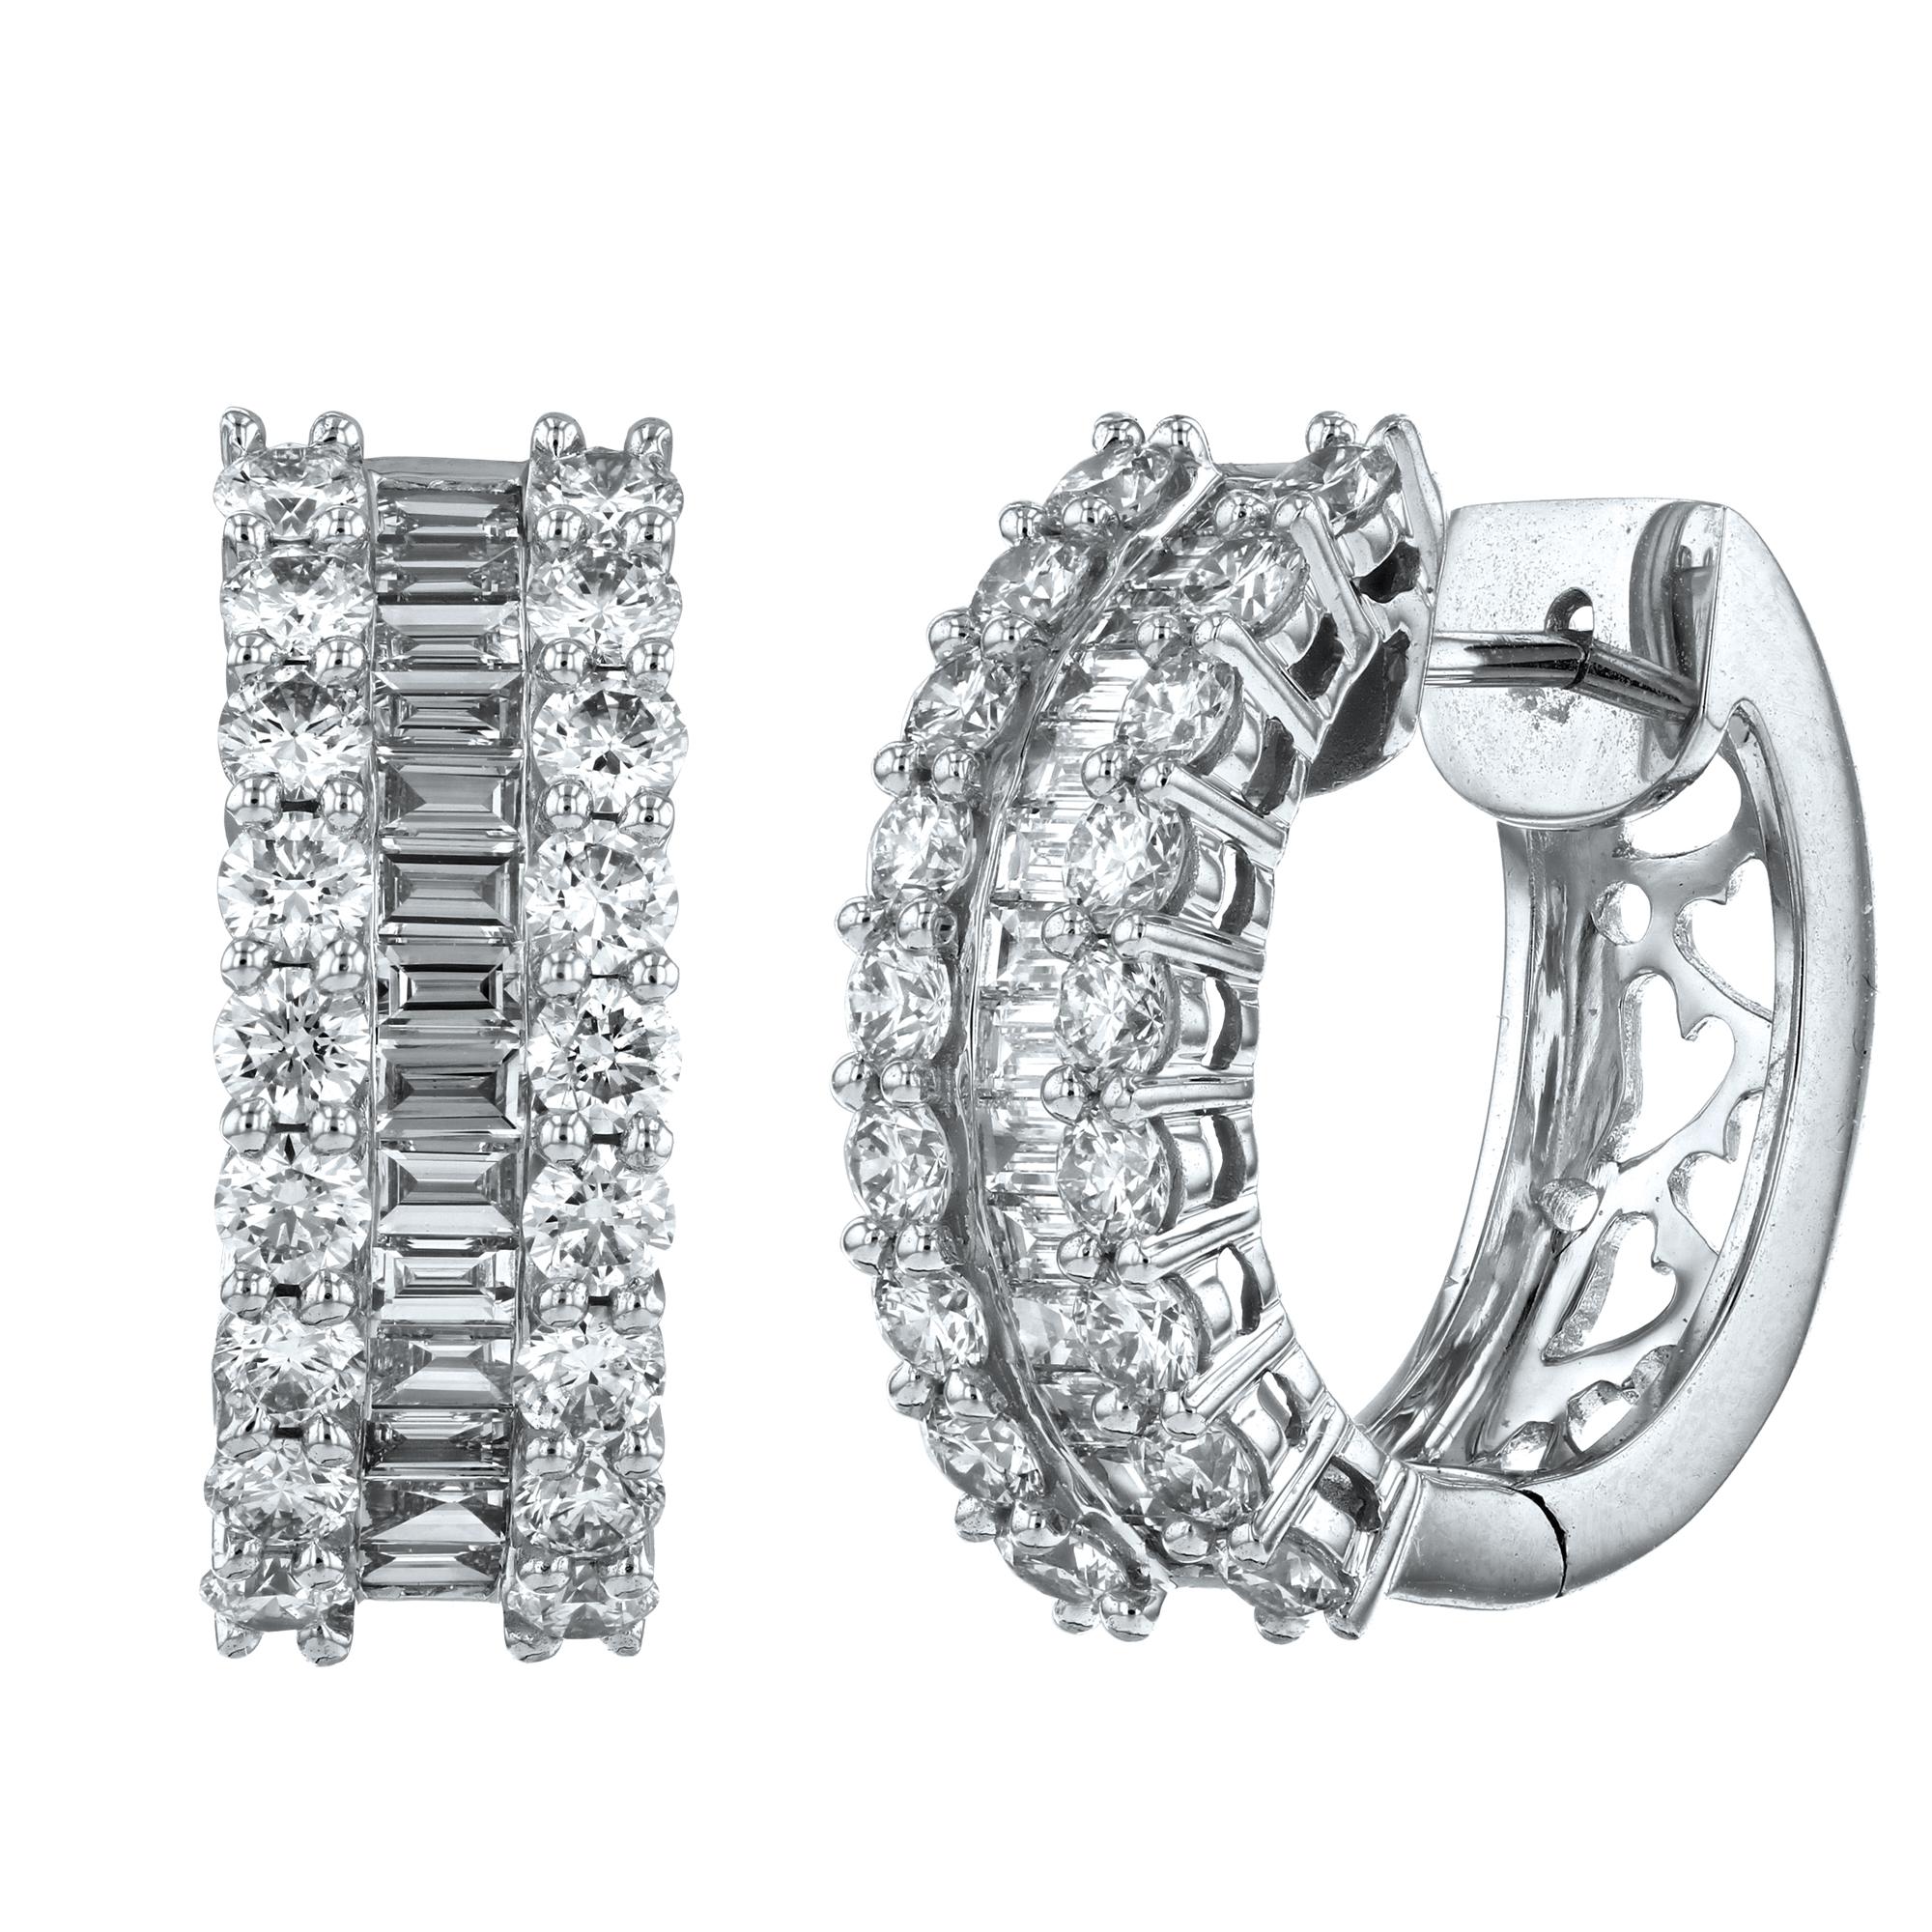 View 3.45ctw Diamond Hoop Earrings in 18k White Gold